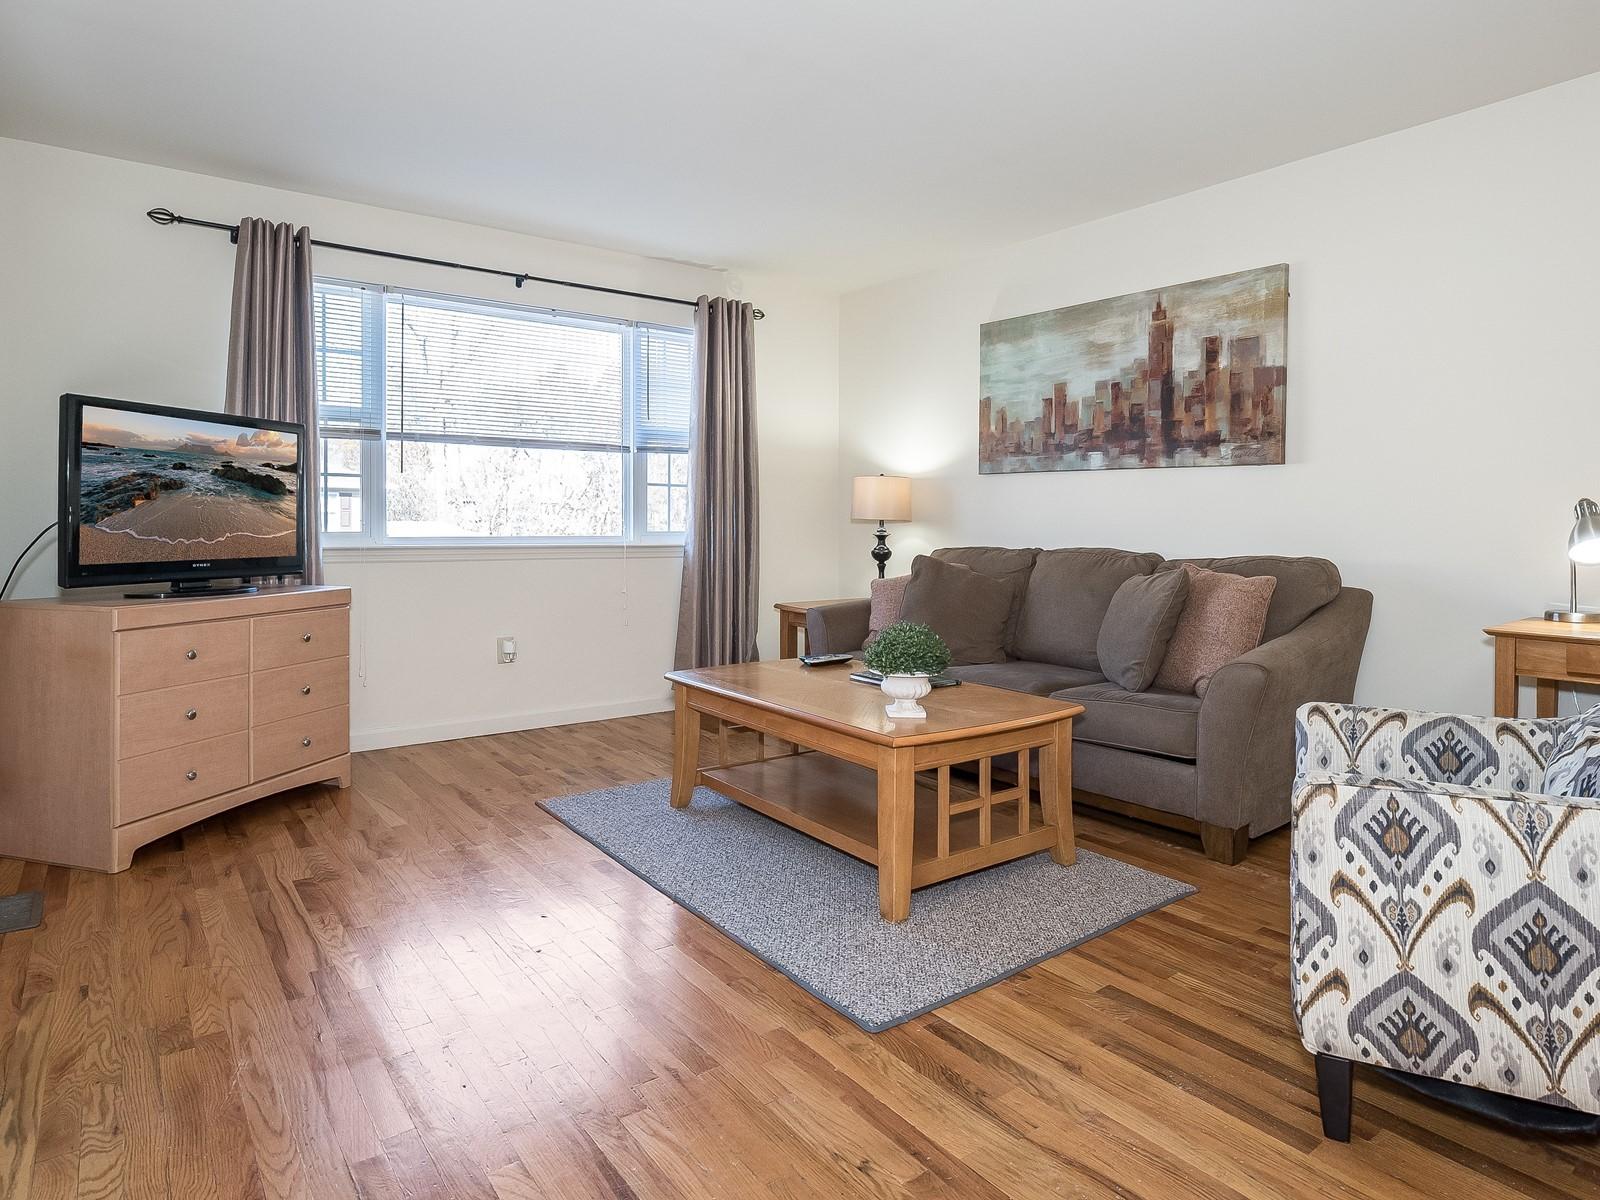 02-Bridgewater FurnishedApartment_22_Living Room2